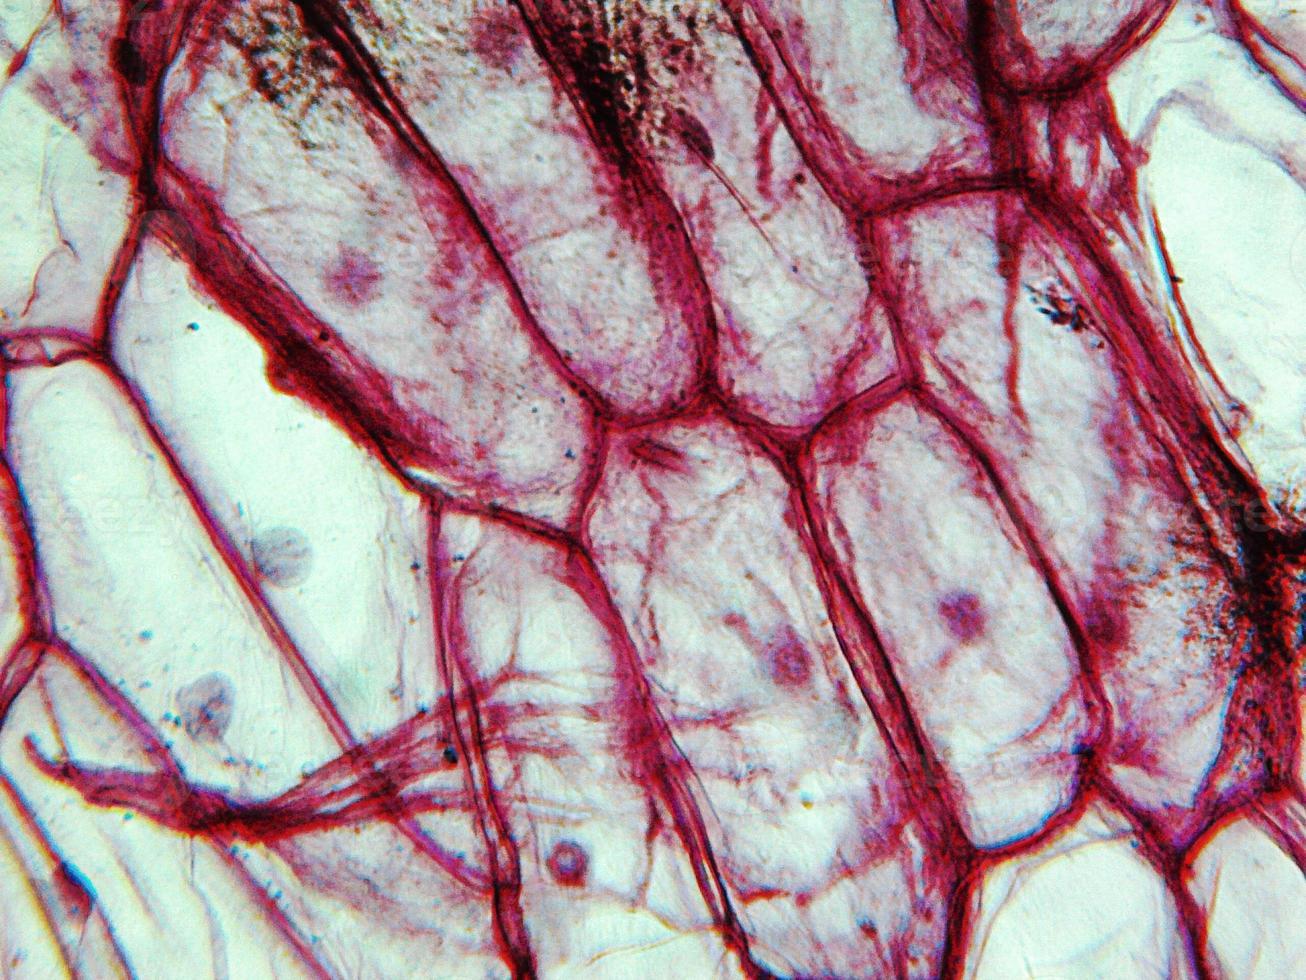 micrografia de epiderme de cebola foto